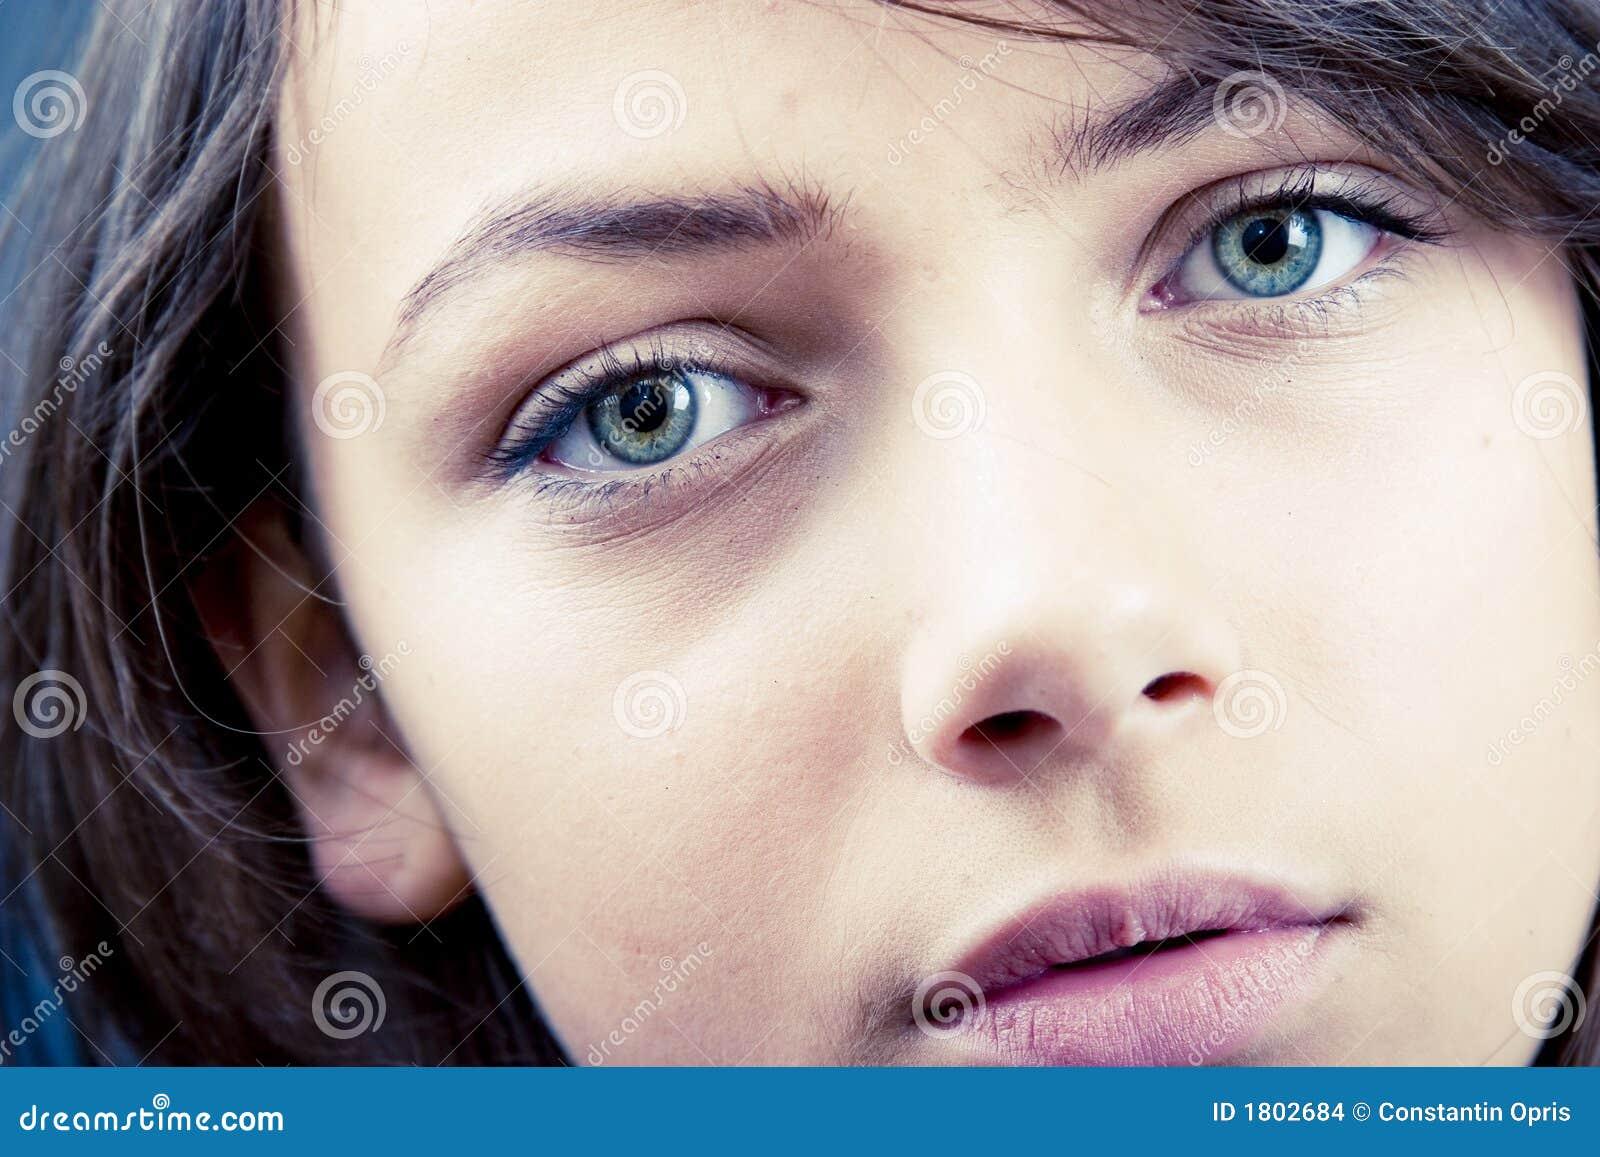 beautiful eyes stock images image 1802684 sad face clipart black and white sad face clip art animals